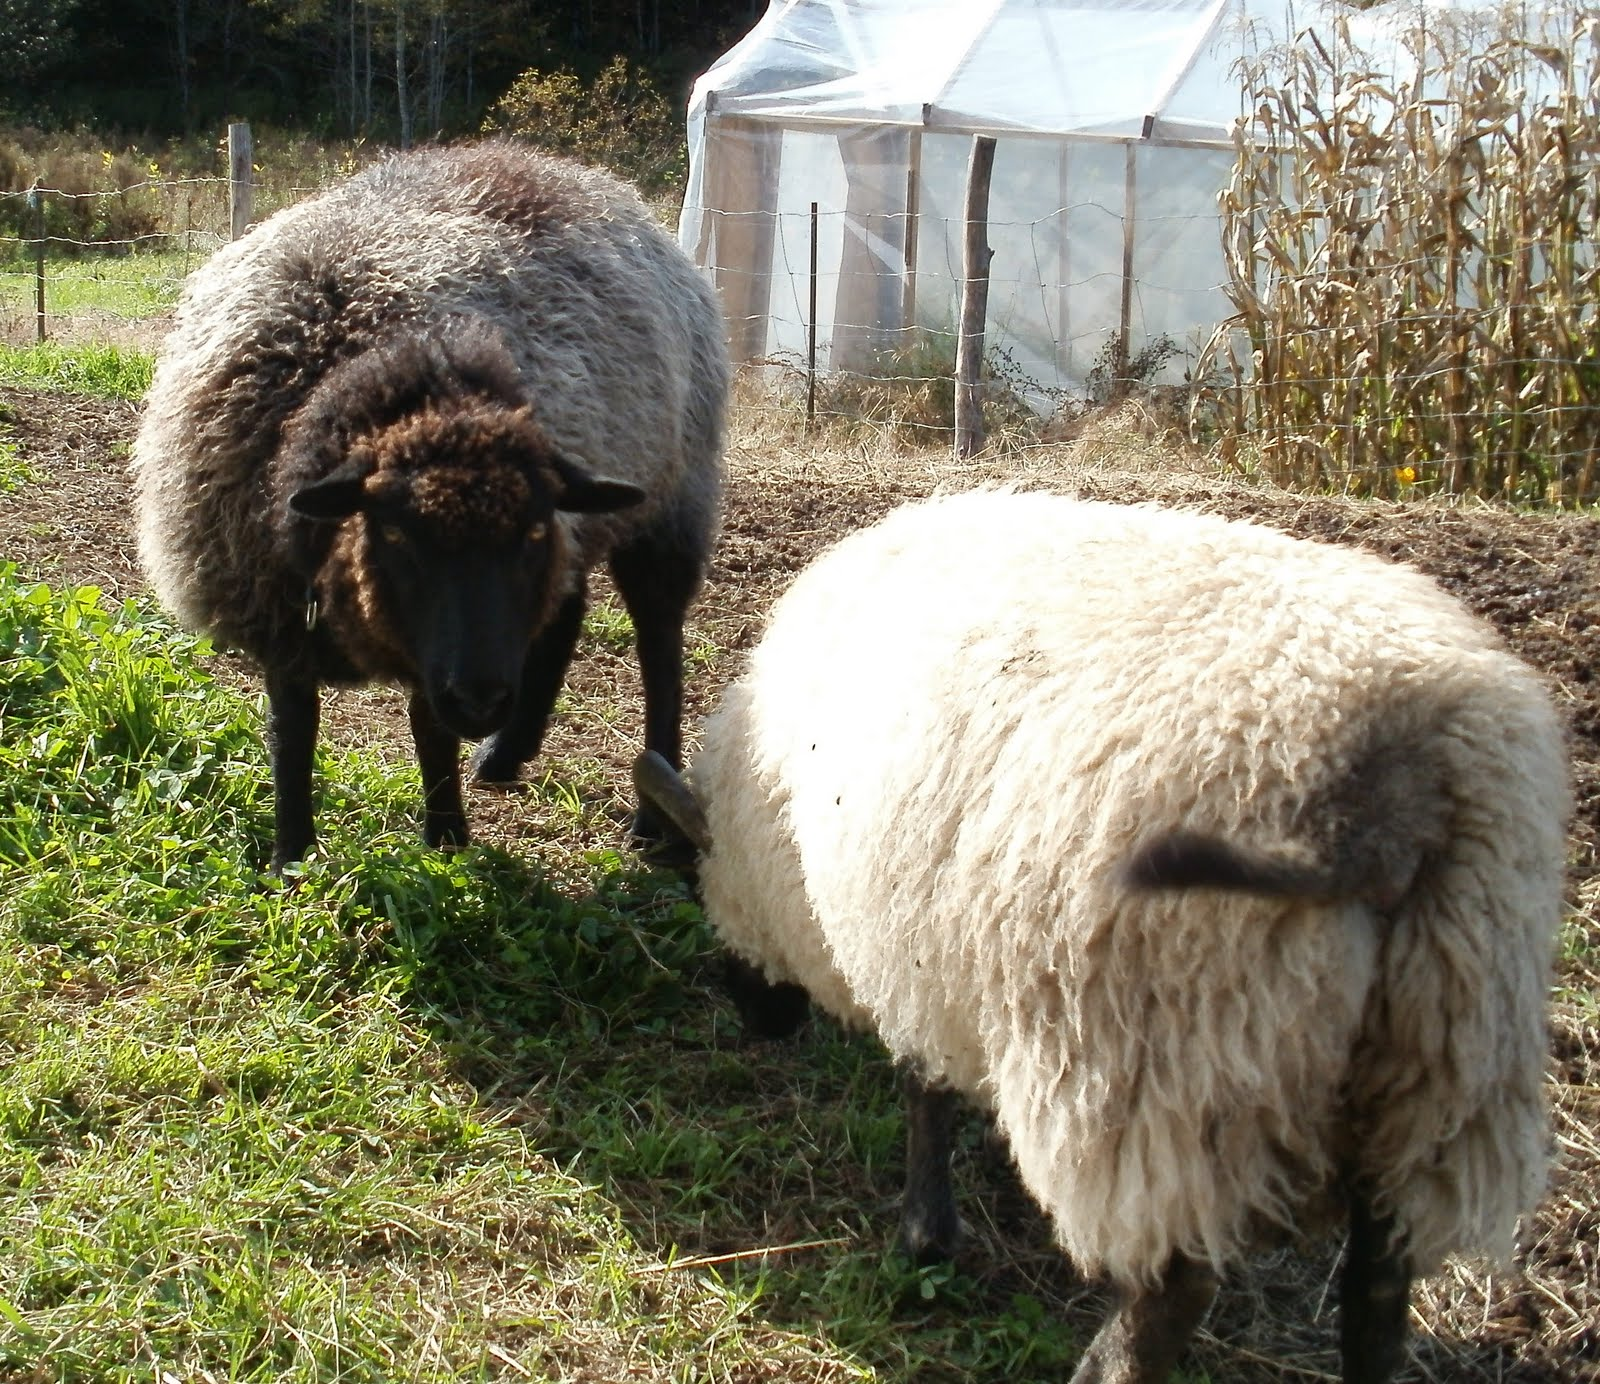 Pics of a sheeps asshole